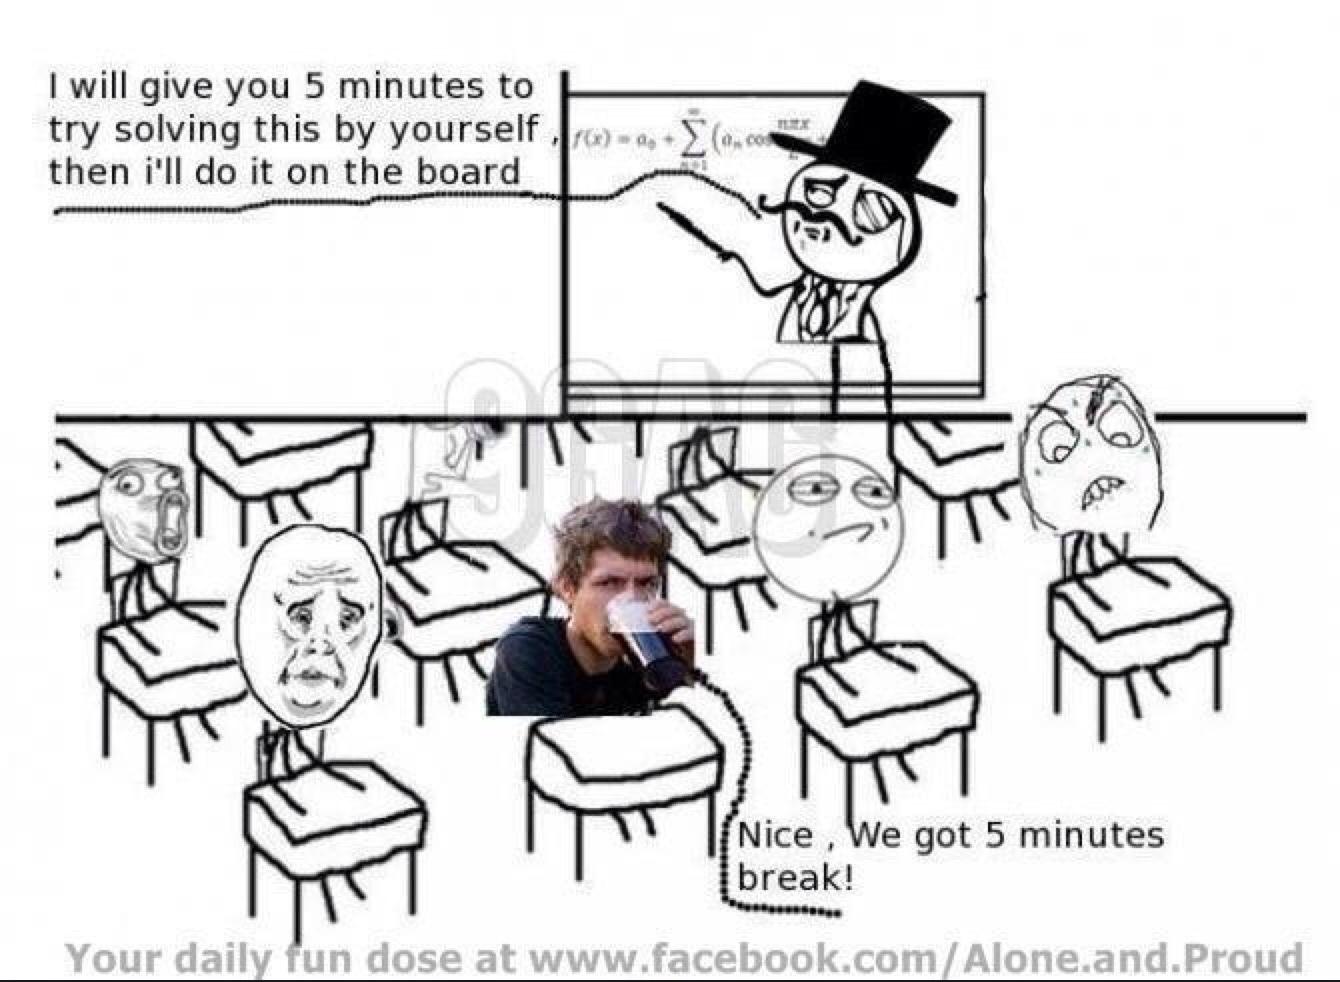 We get a 5 minute break - meme